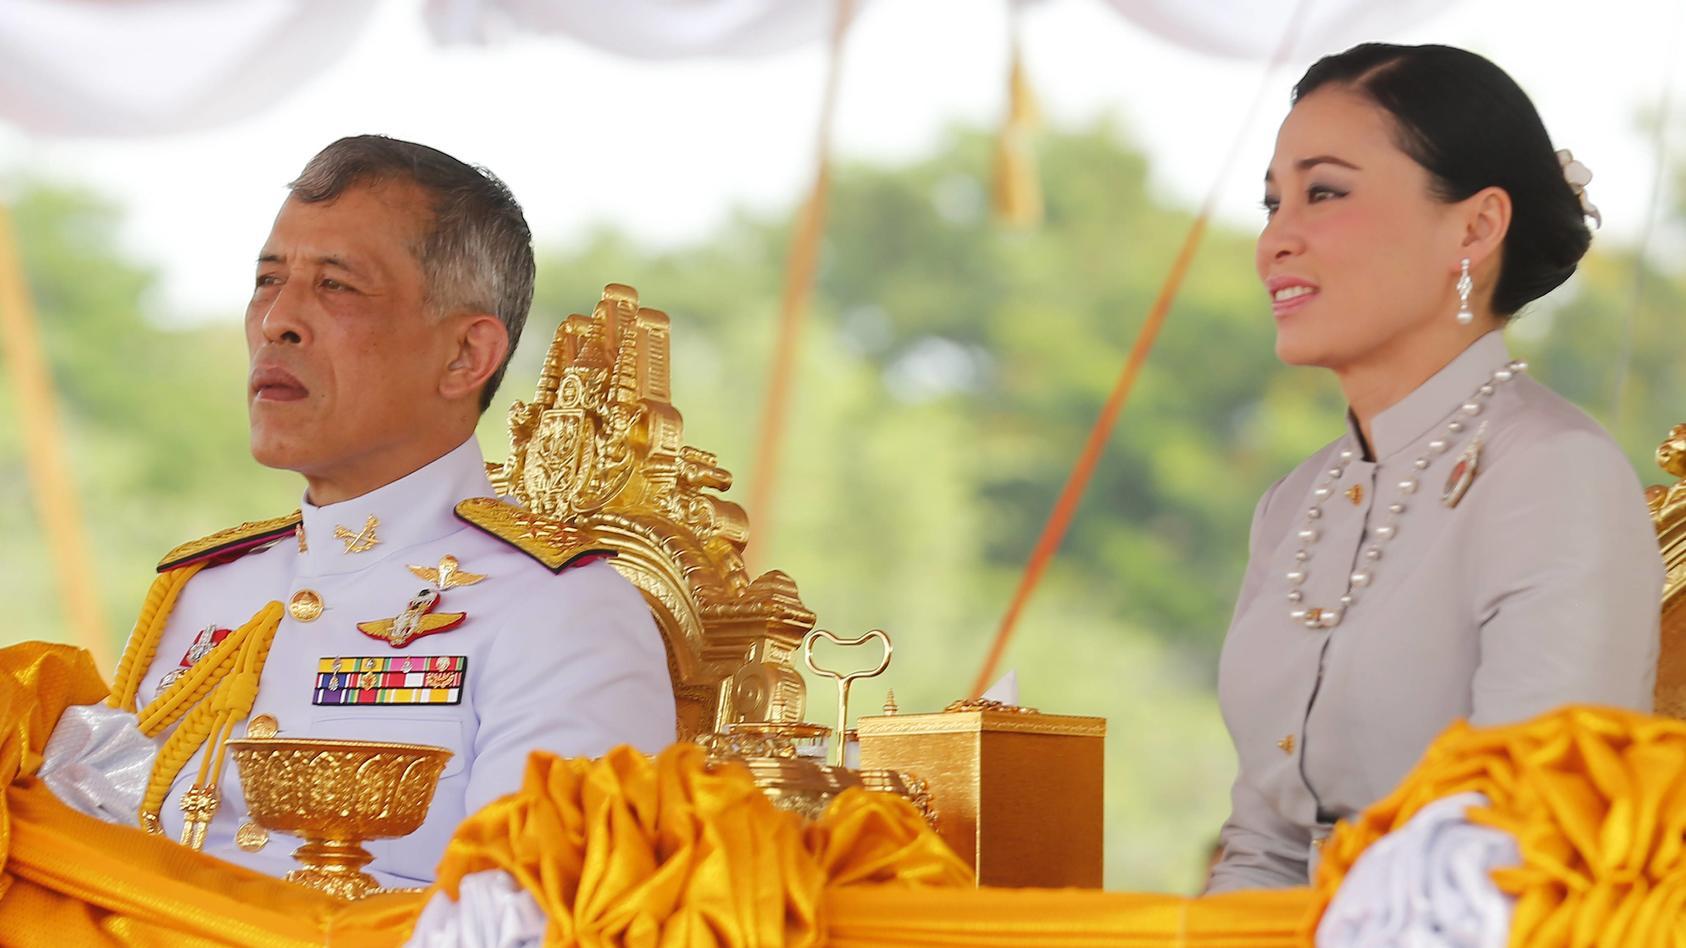 May 9, 2019 - Bangkok, Thailand - Thailand s King Maha Vajiralongkorn Bodindradebayavarangkun (Rama X) and Queen Suthid